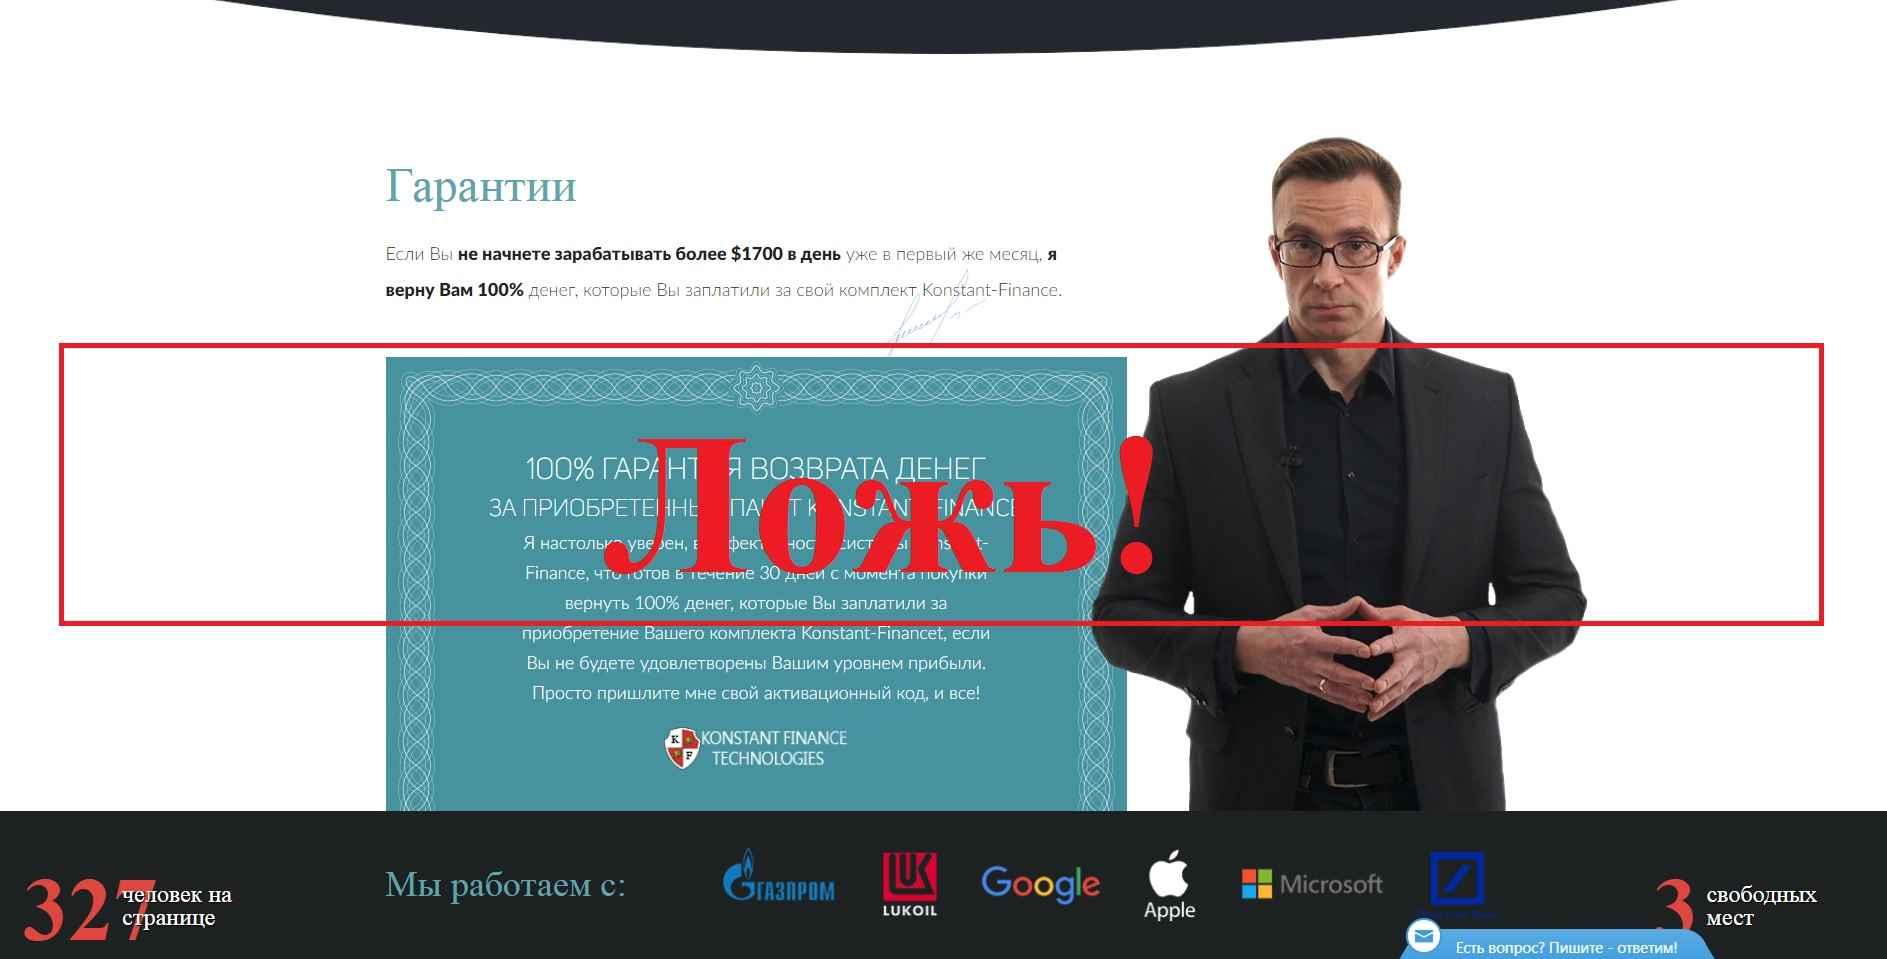 Konstant Finance – обзор и отзывы о Констант Финанс Технолоджи